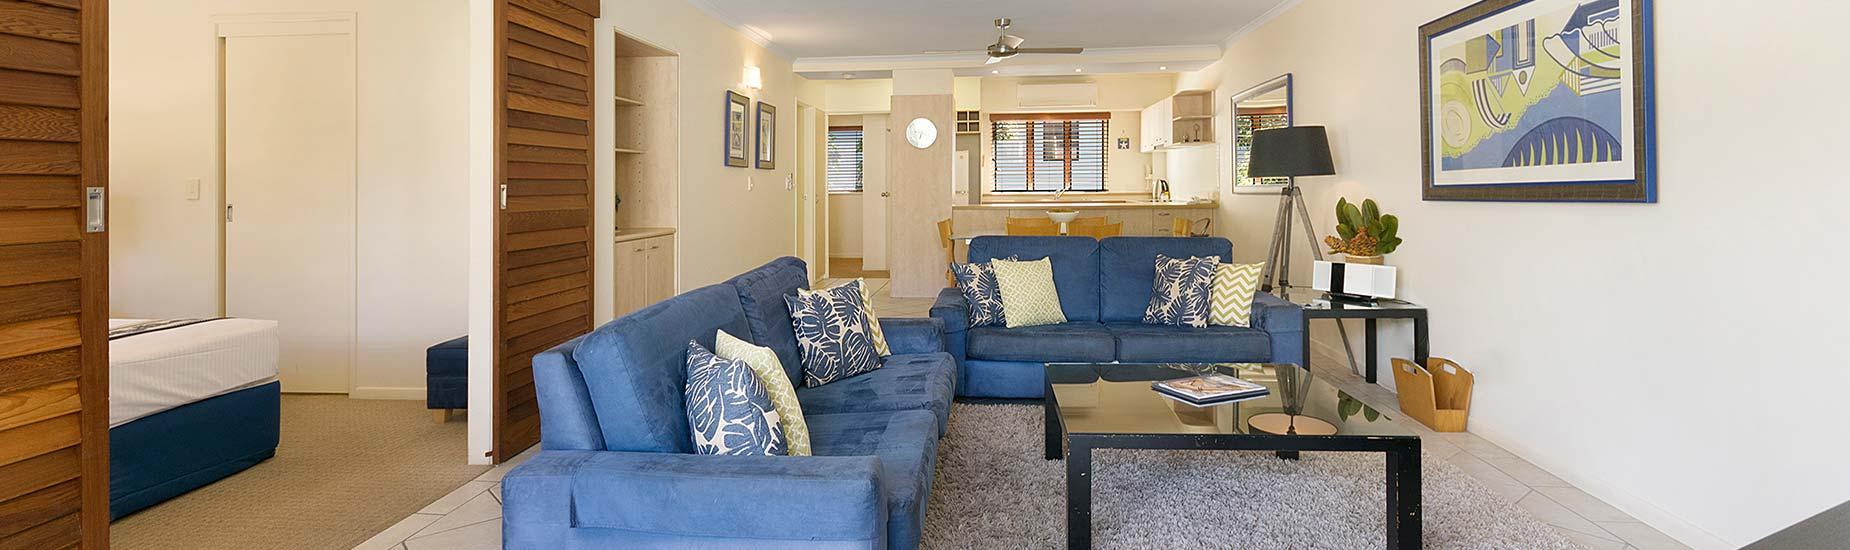 noosa accommodation noosa resort montpellier boutique resort noosa sunshine coast queensland. Black Bedroom Furniture Sets. Home Design Ideas